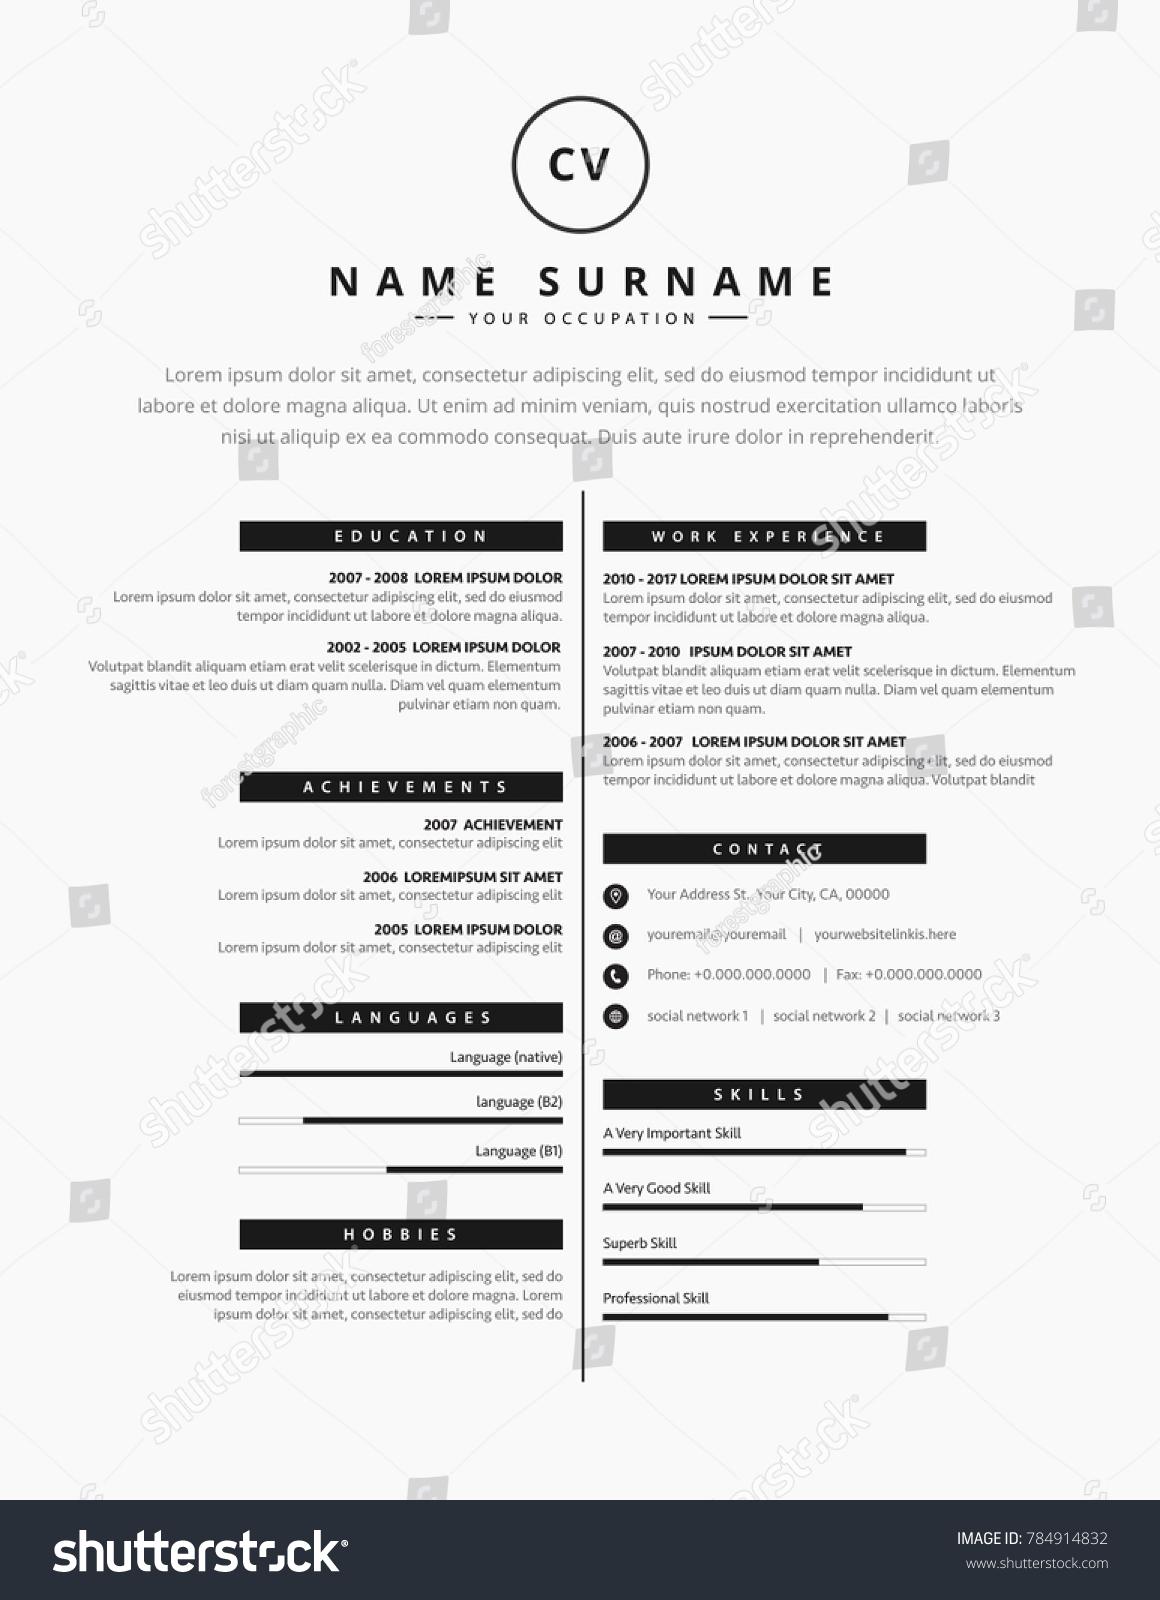 cv resume template design creative personのベクター画像素材